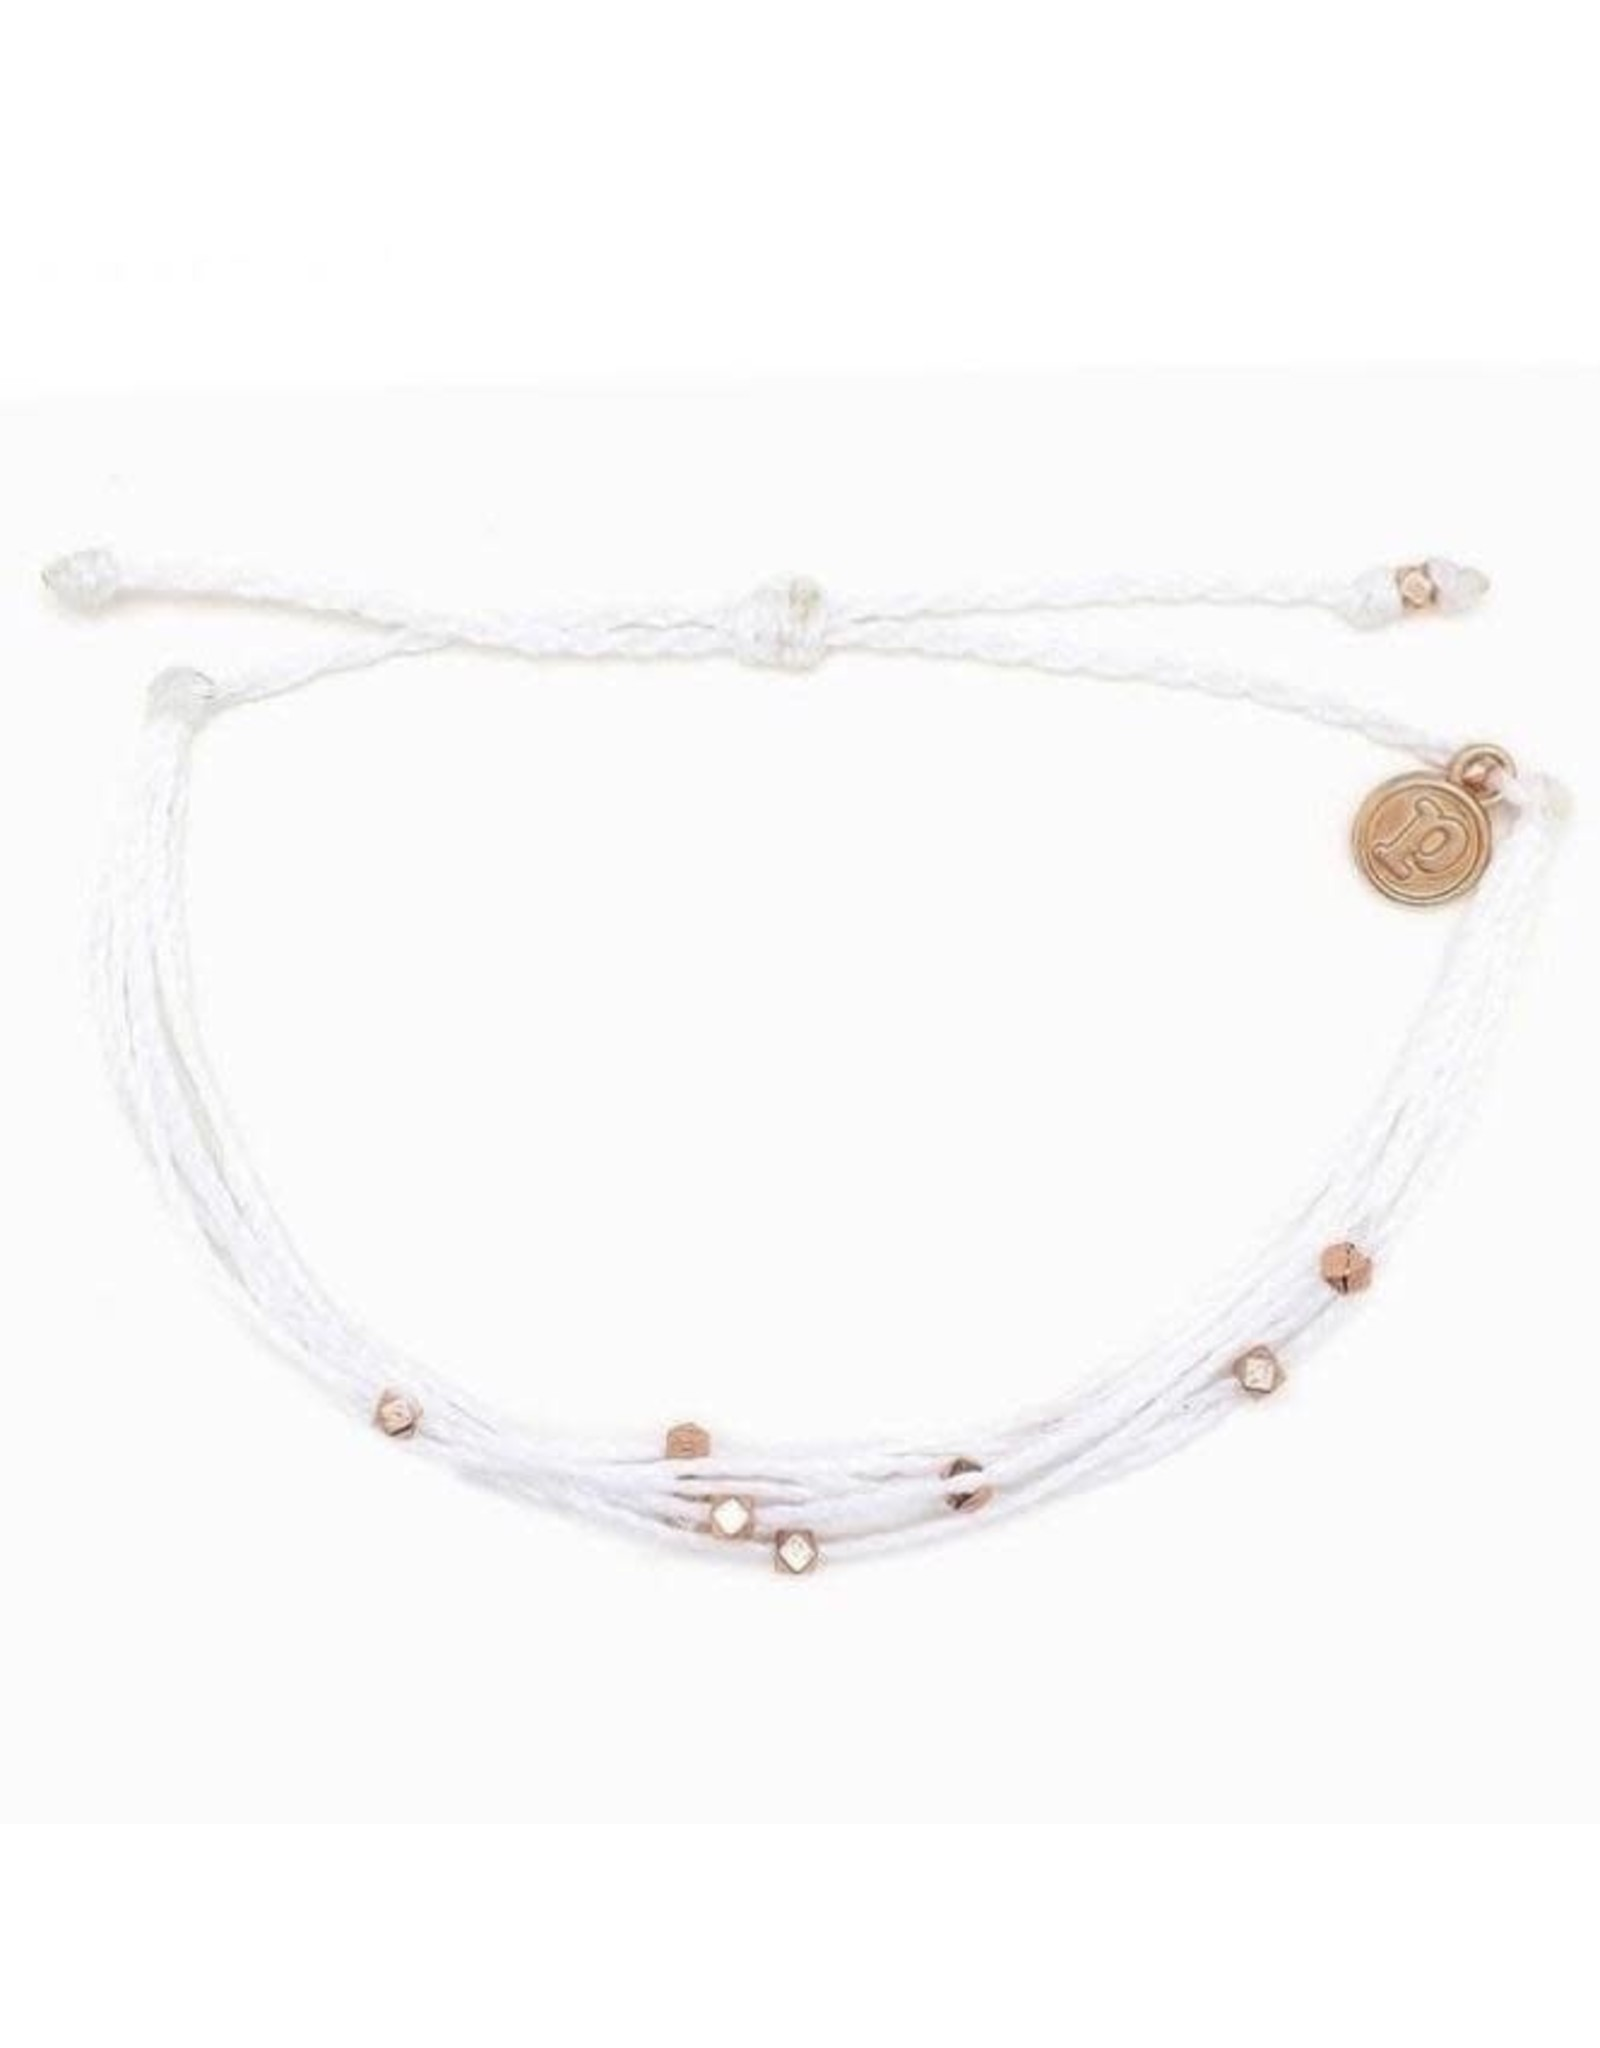 Pura Vida Pura Vida, Malibu Rose Gold Bracelet, White